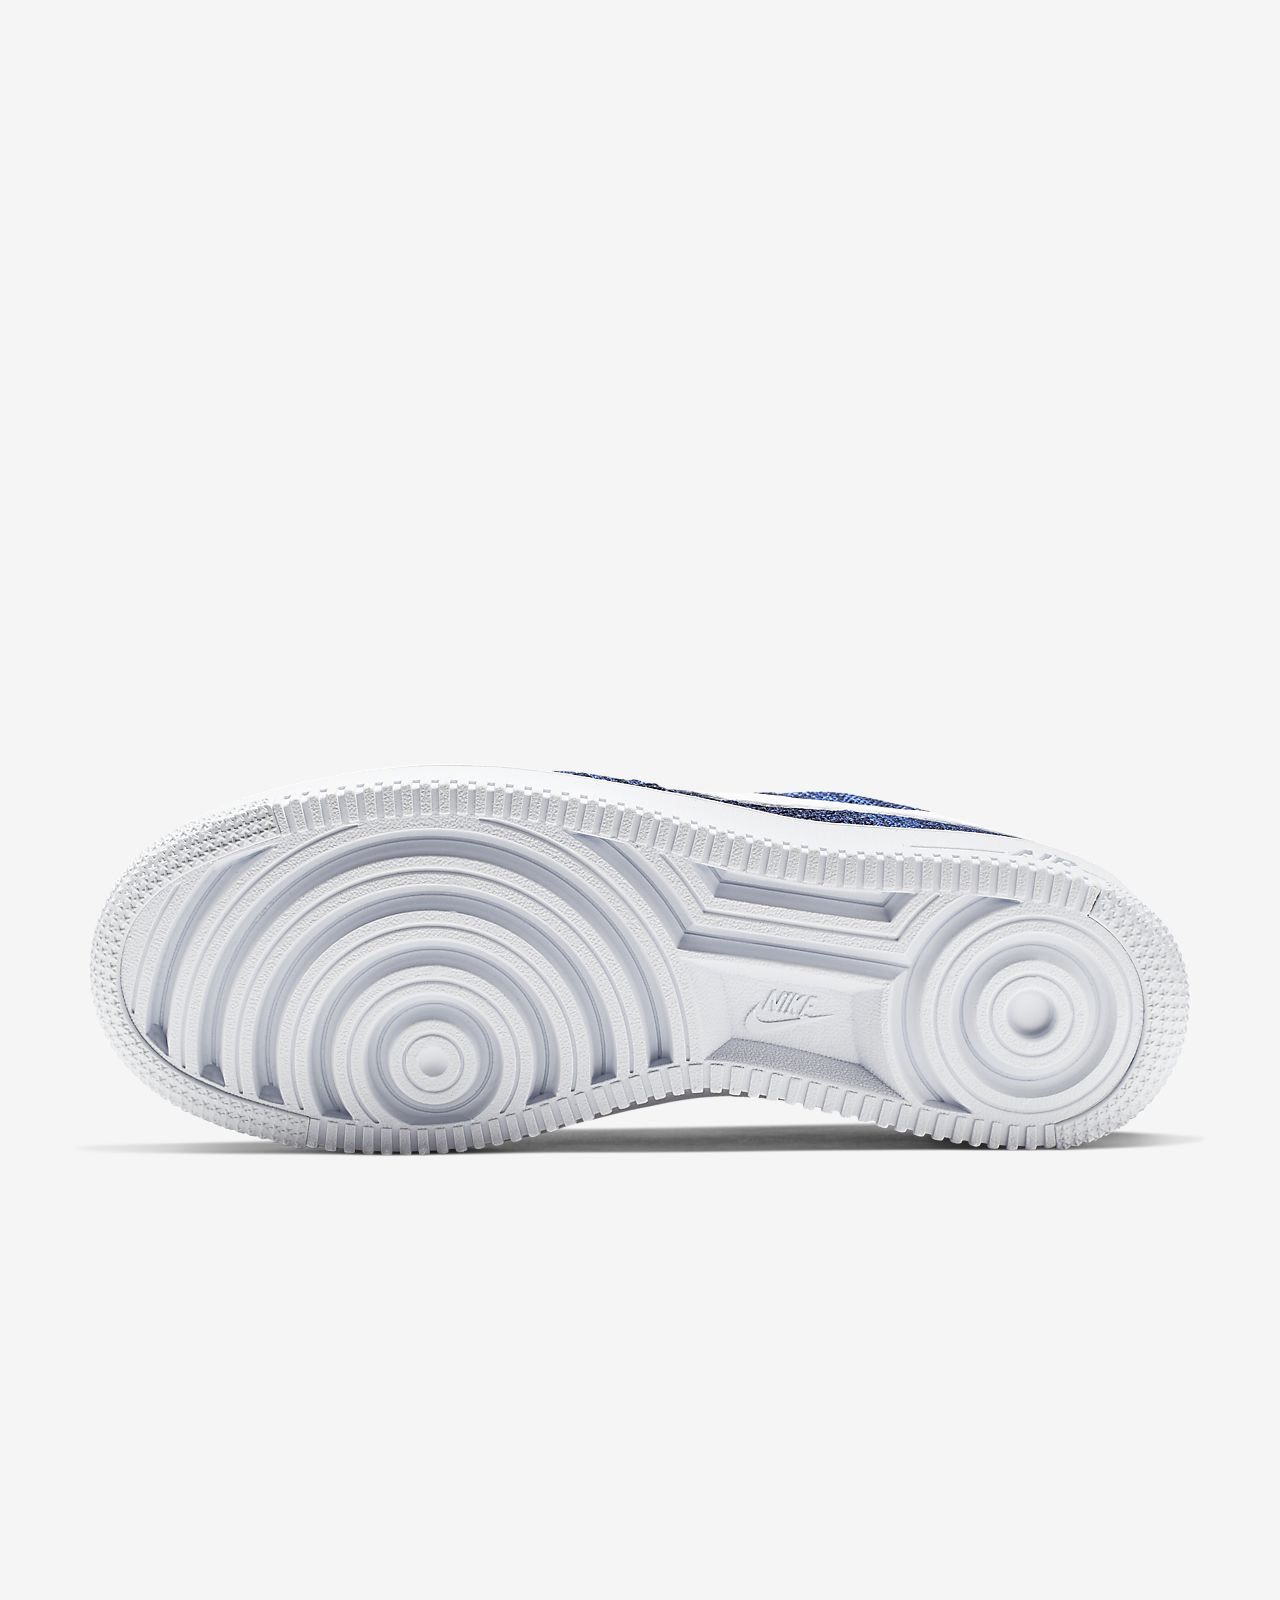 wholesale dealer 5817d bc886 Nike Air Force 1 Flyknit 2.0 Shoe